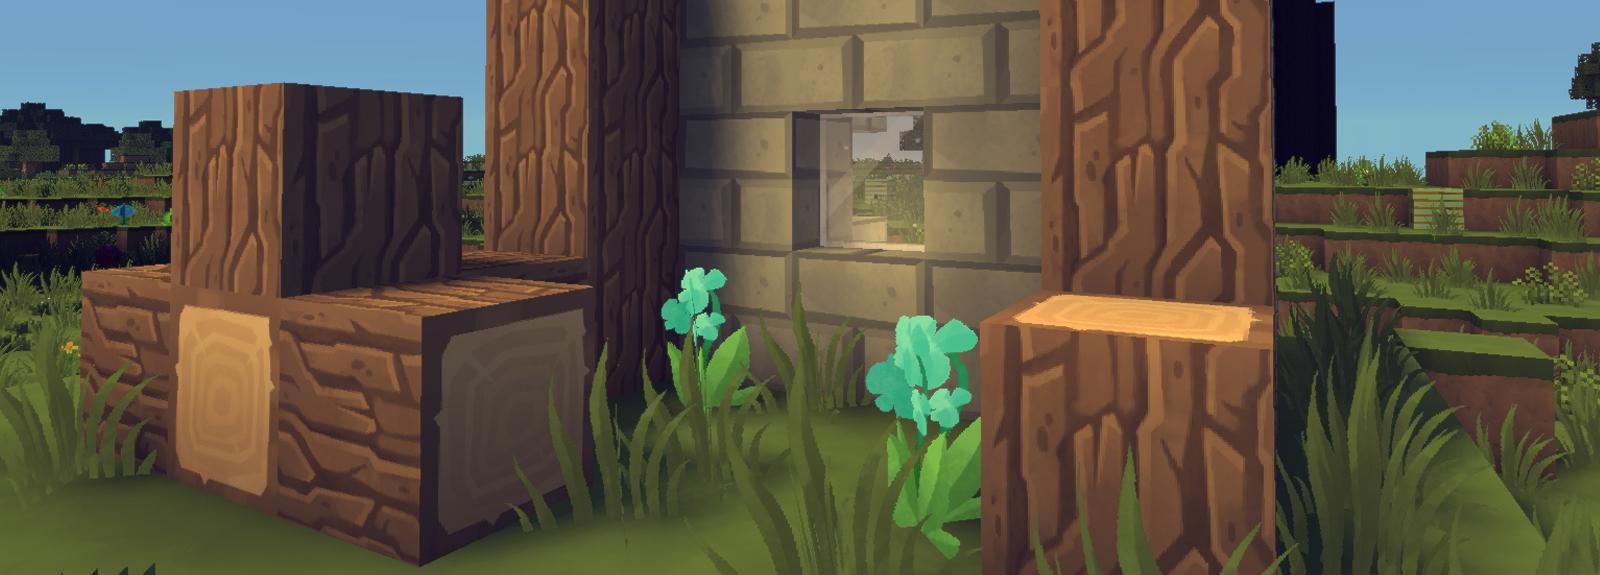 ZigZag – A Cute-tastic Resourcepack for Minecraft